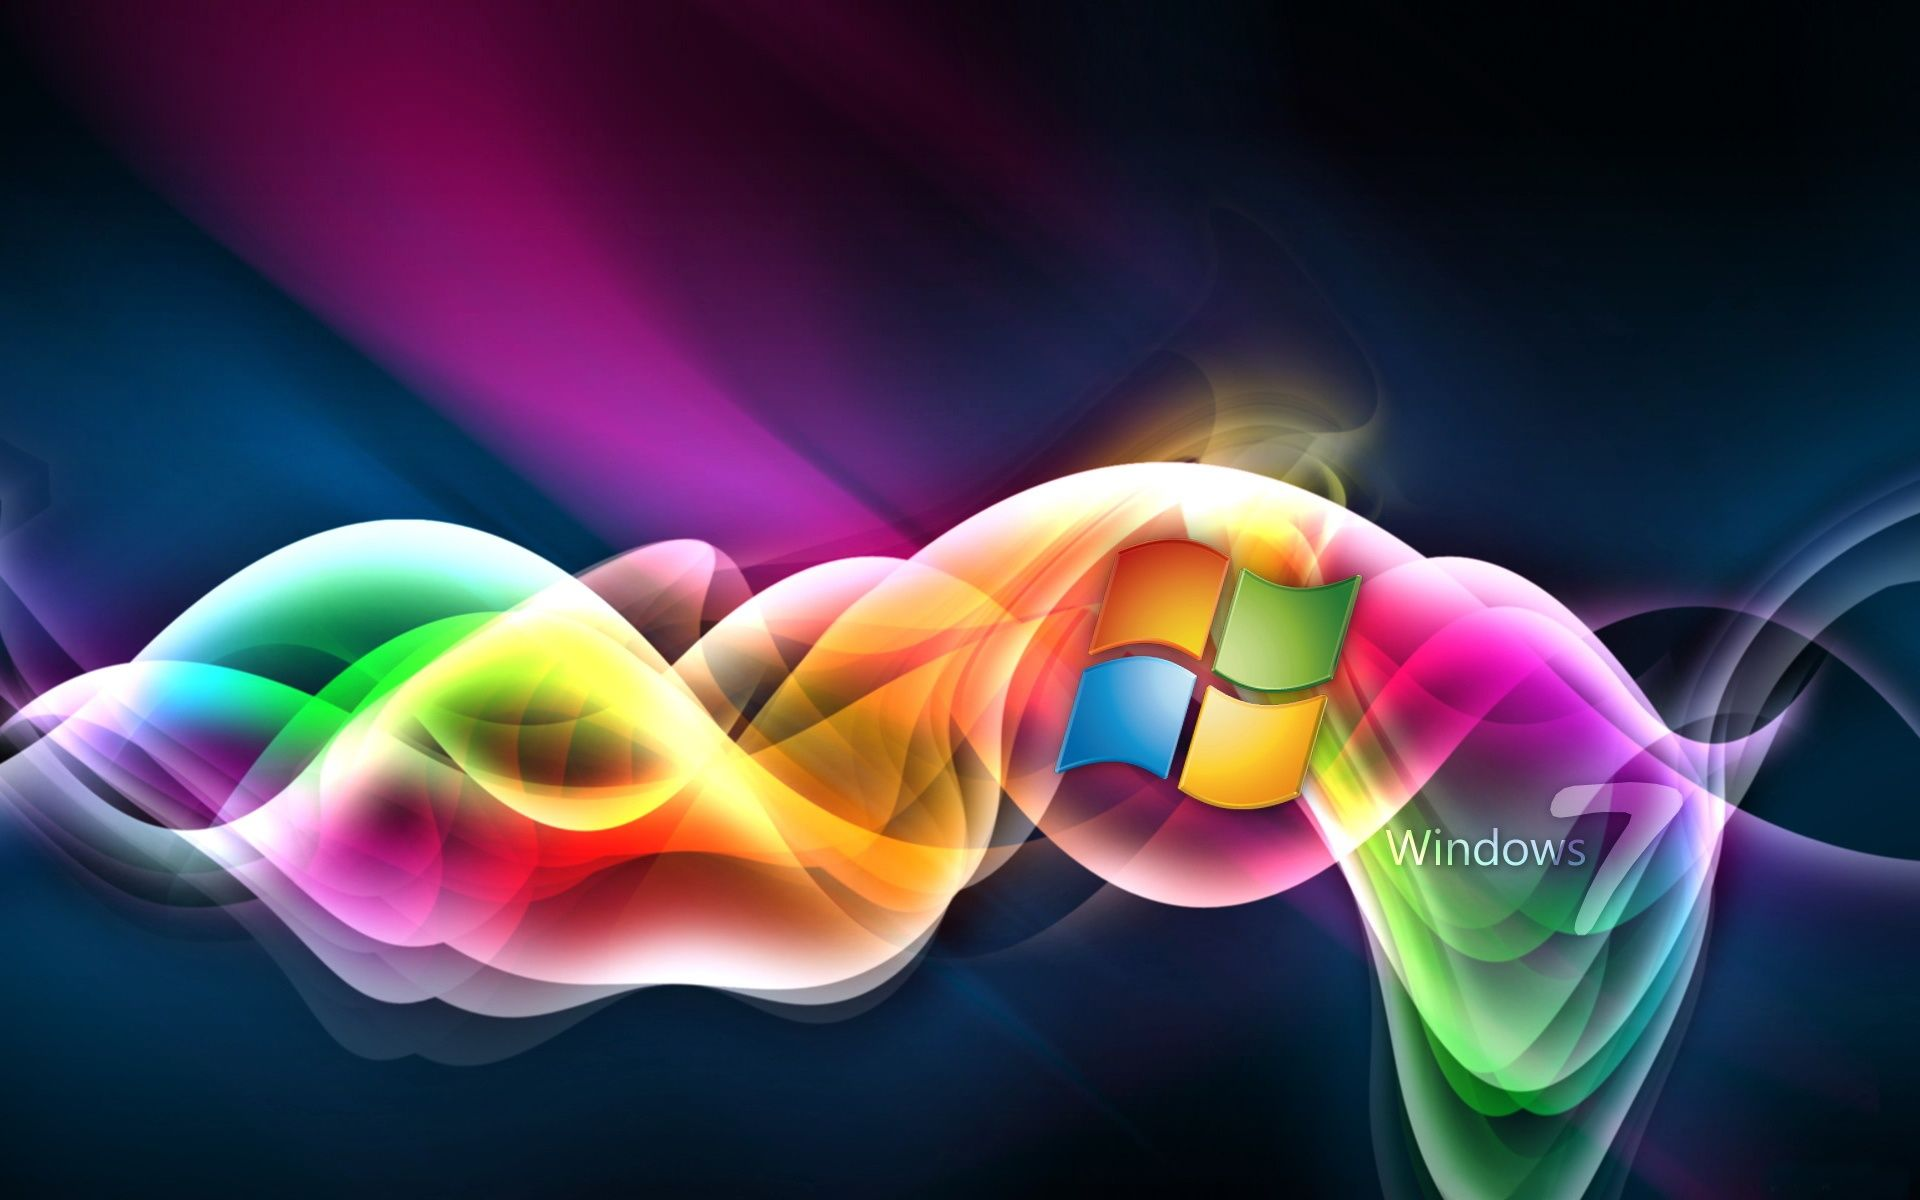 Desktop wallpapers hd for windows 7 - SF Wallpaper